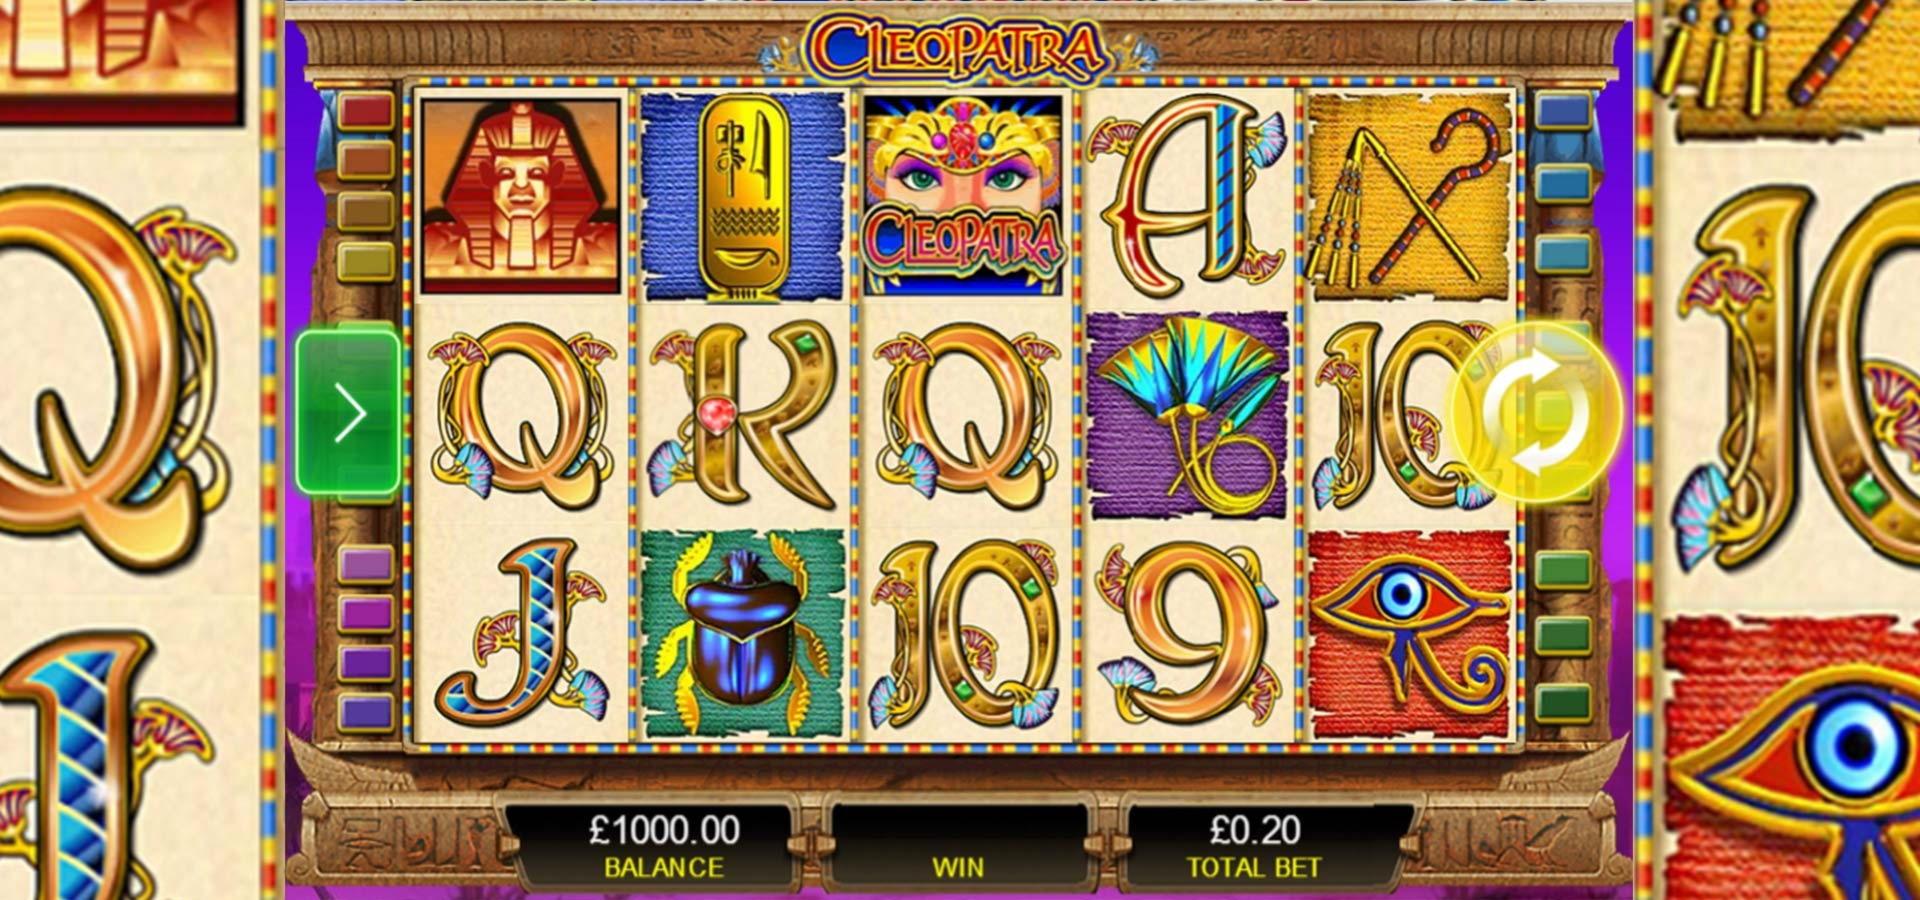 € 950 Daily freeroll slot մրցաշար Կասկադ Casino- ում